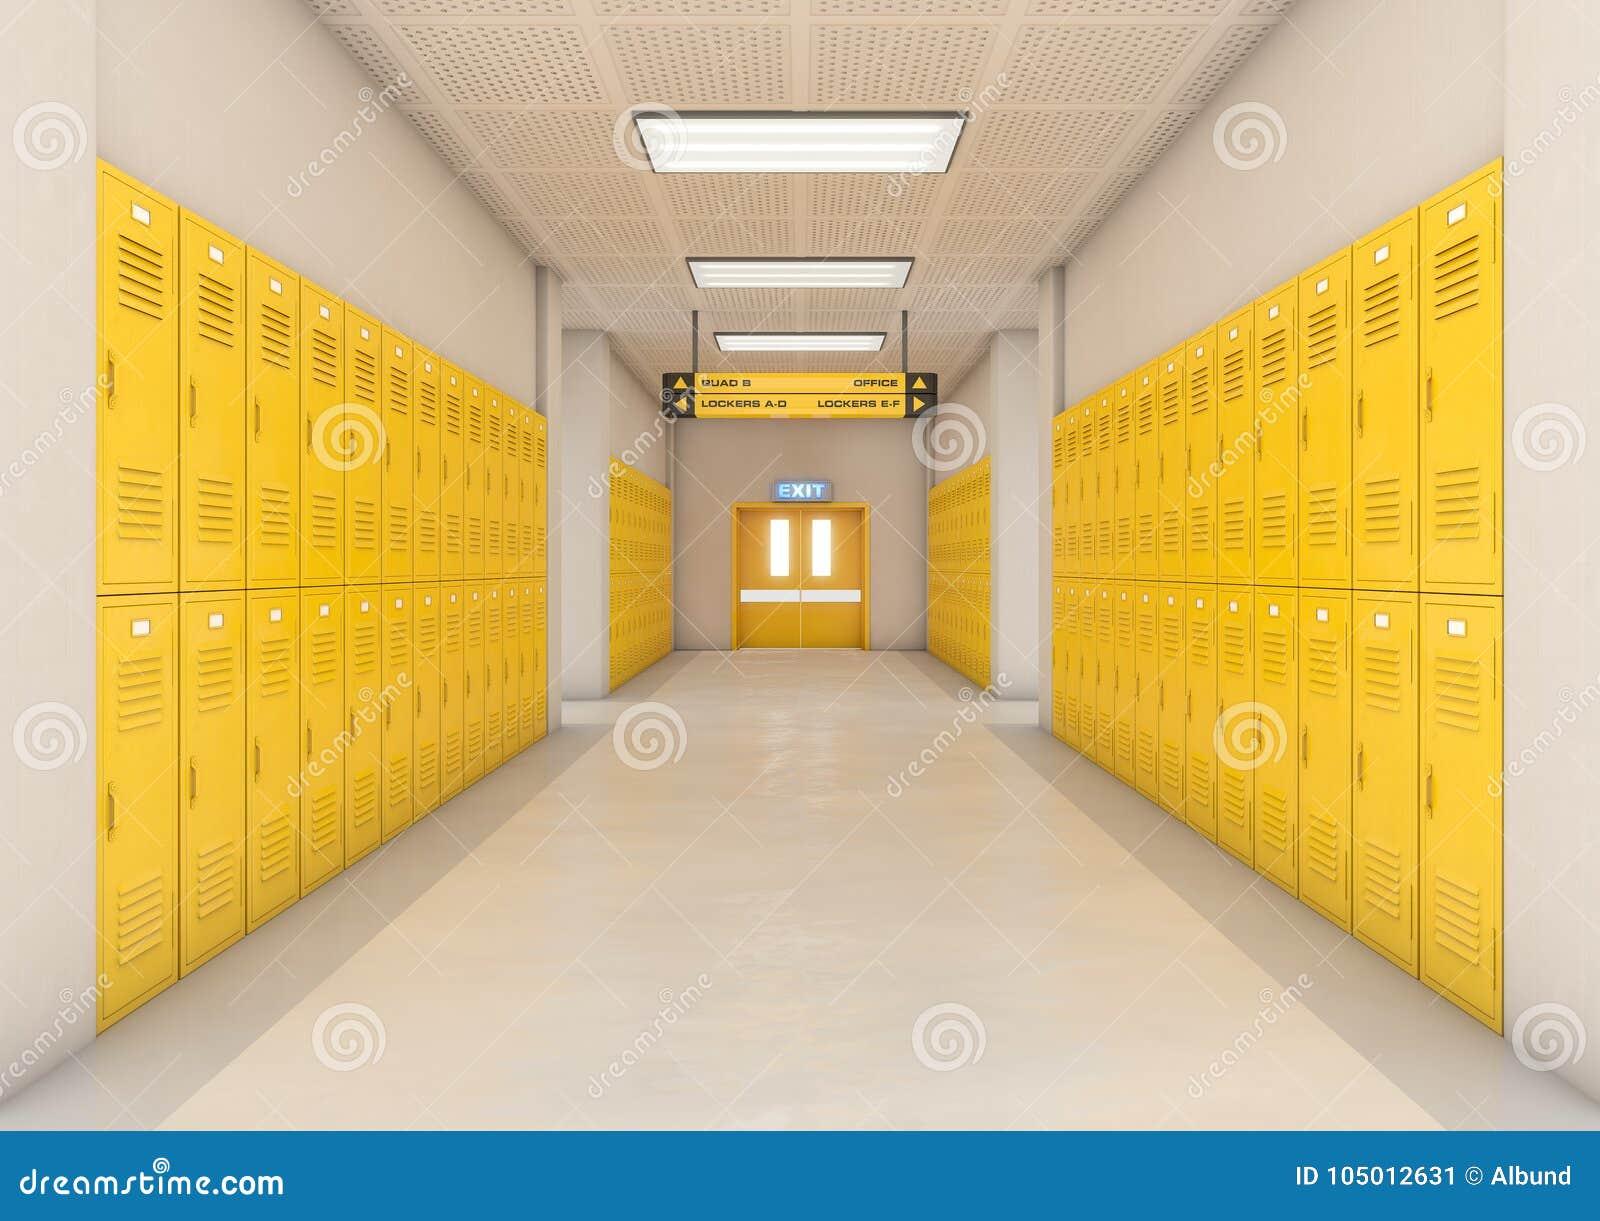 yellow school lockers light stock illustration illustration of